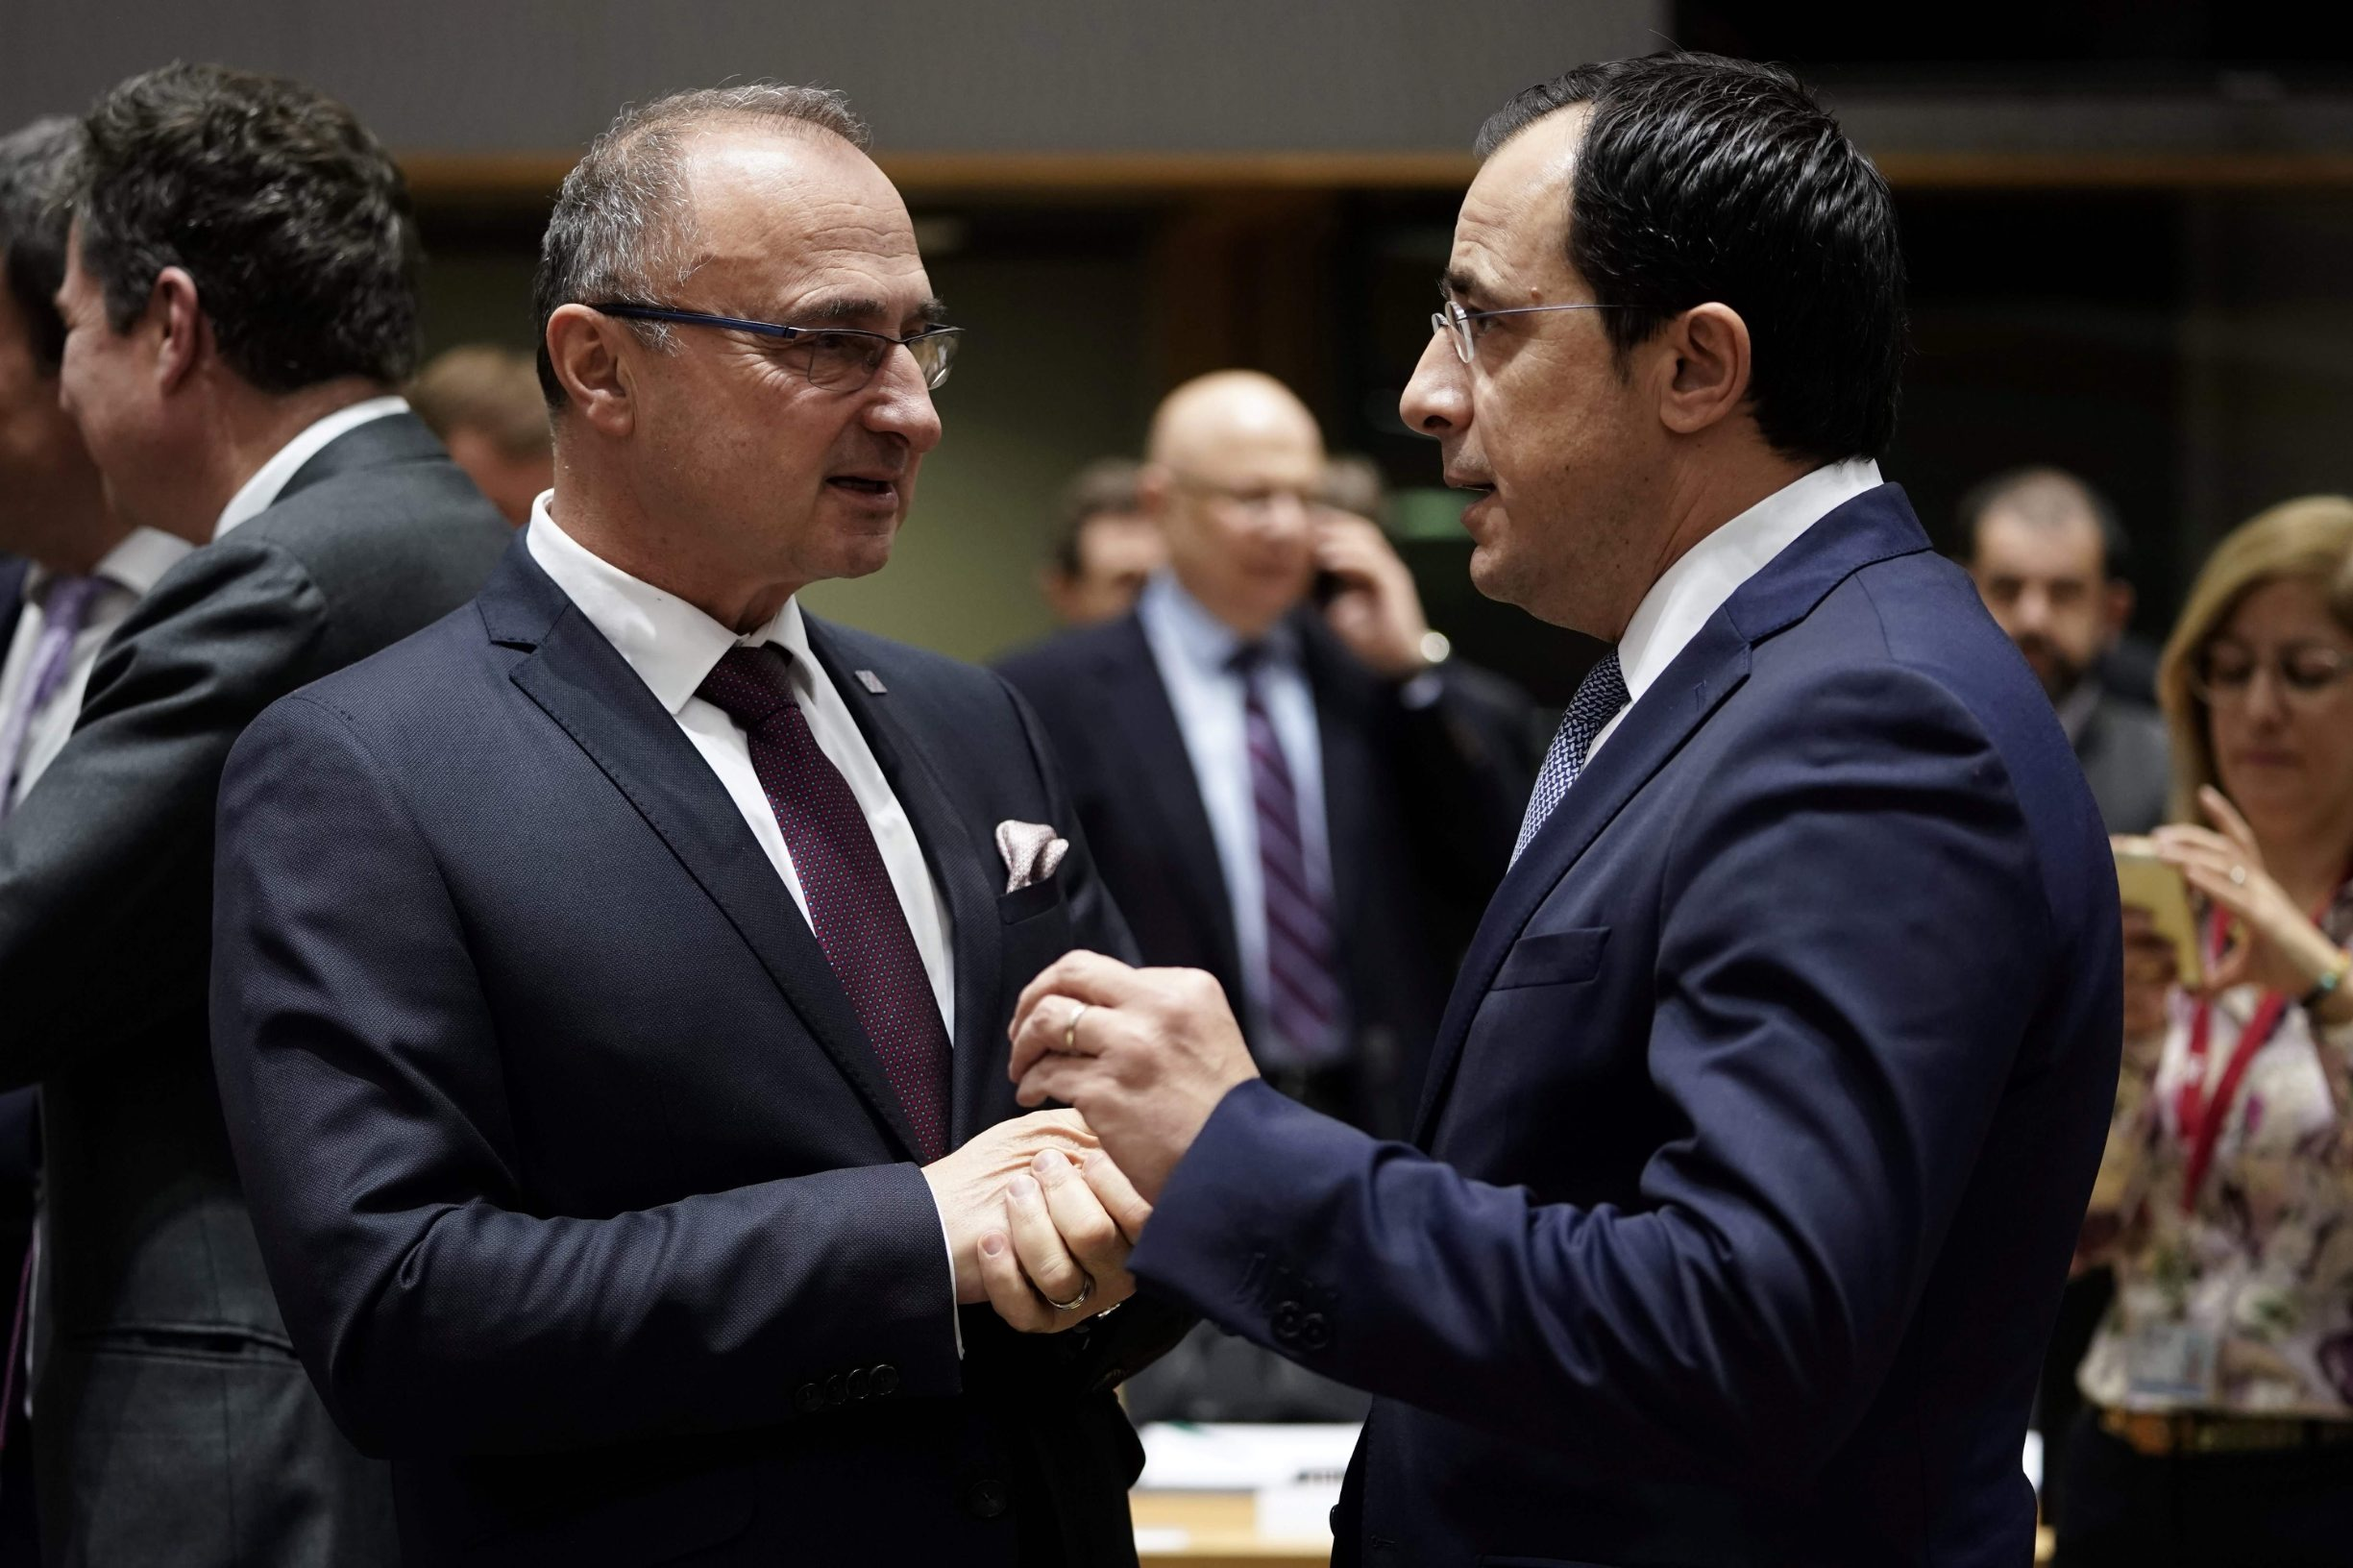 Hrvatski ministar vanjskih i europskih poslova Gordan Grlić Radman lijevo) i ciparski kolega Nikos Christodoulides